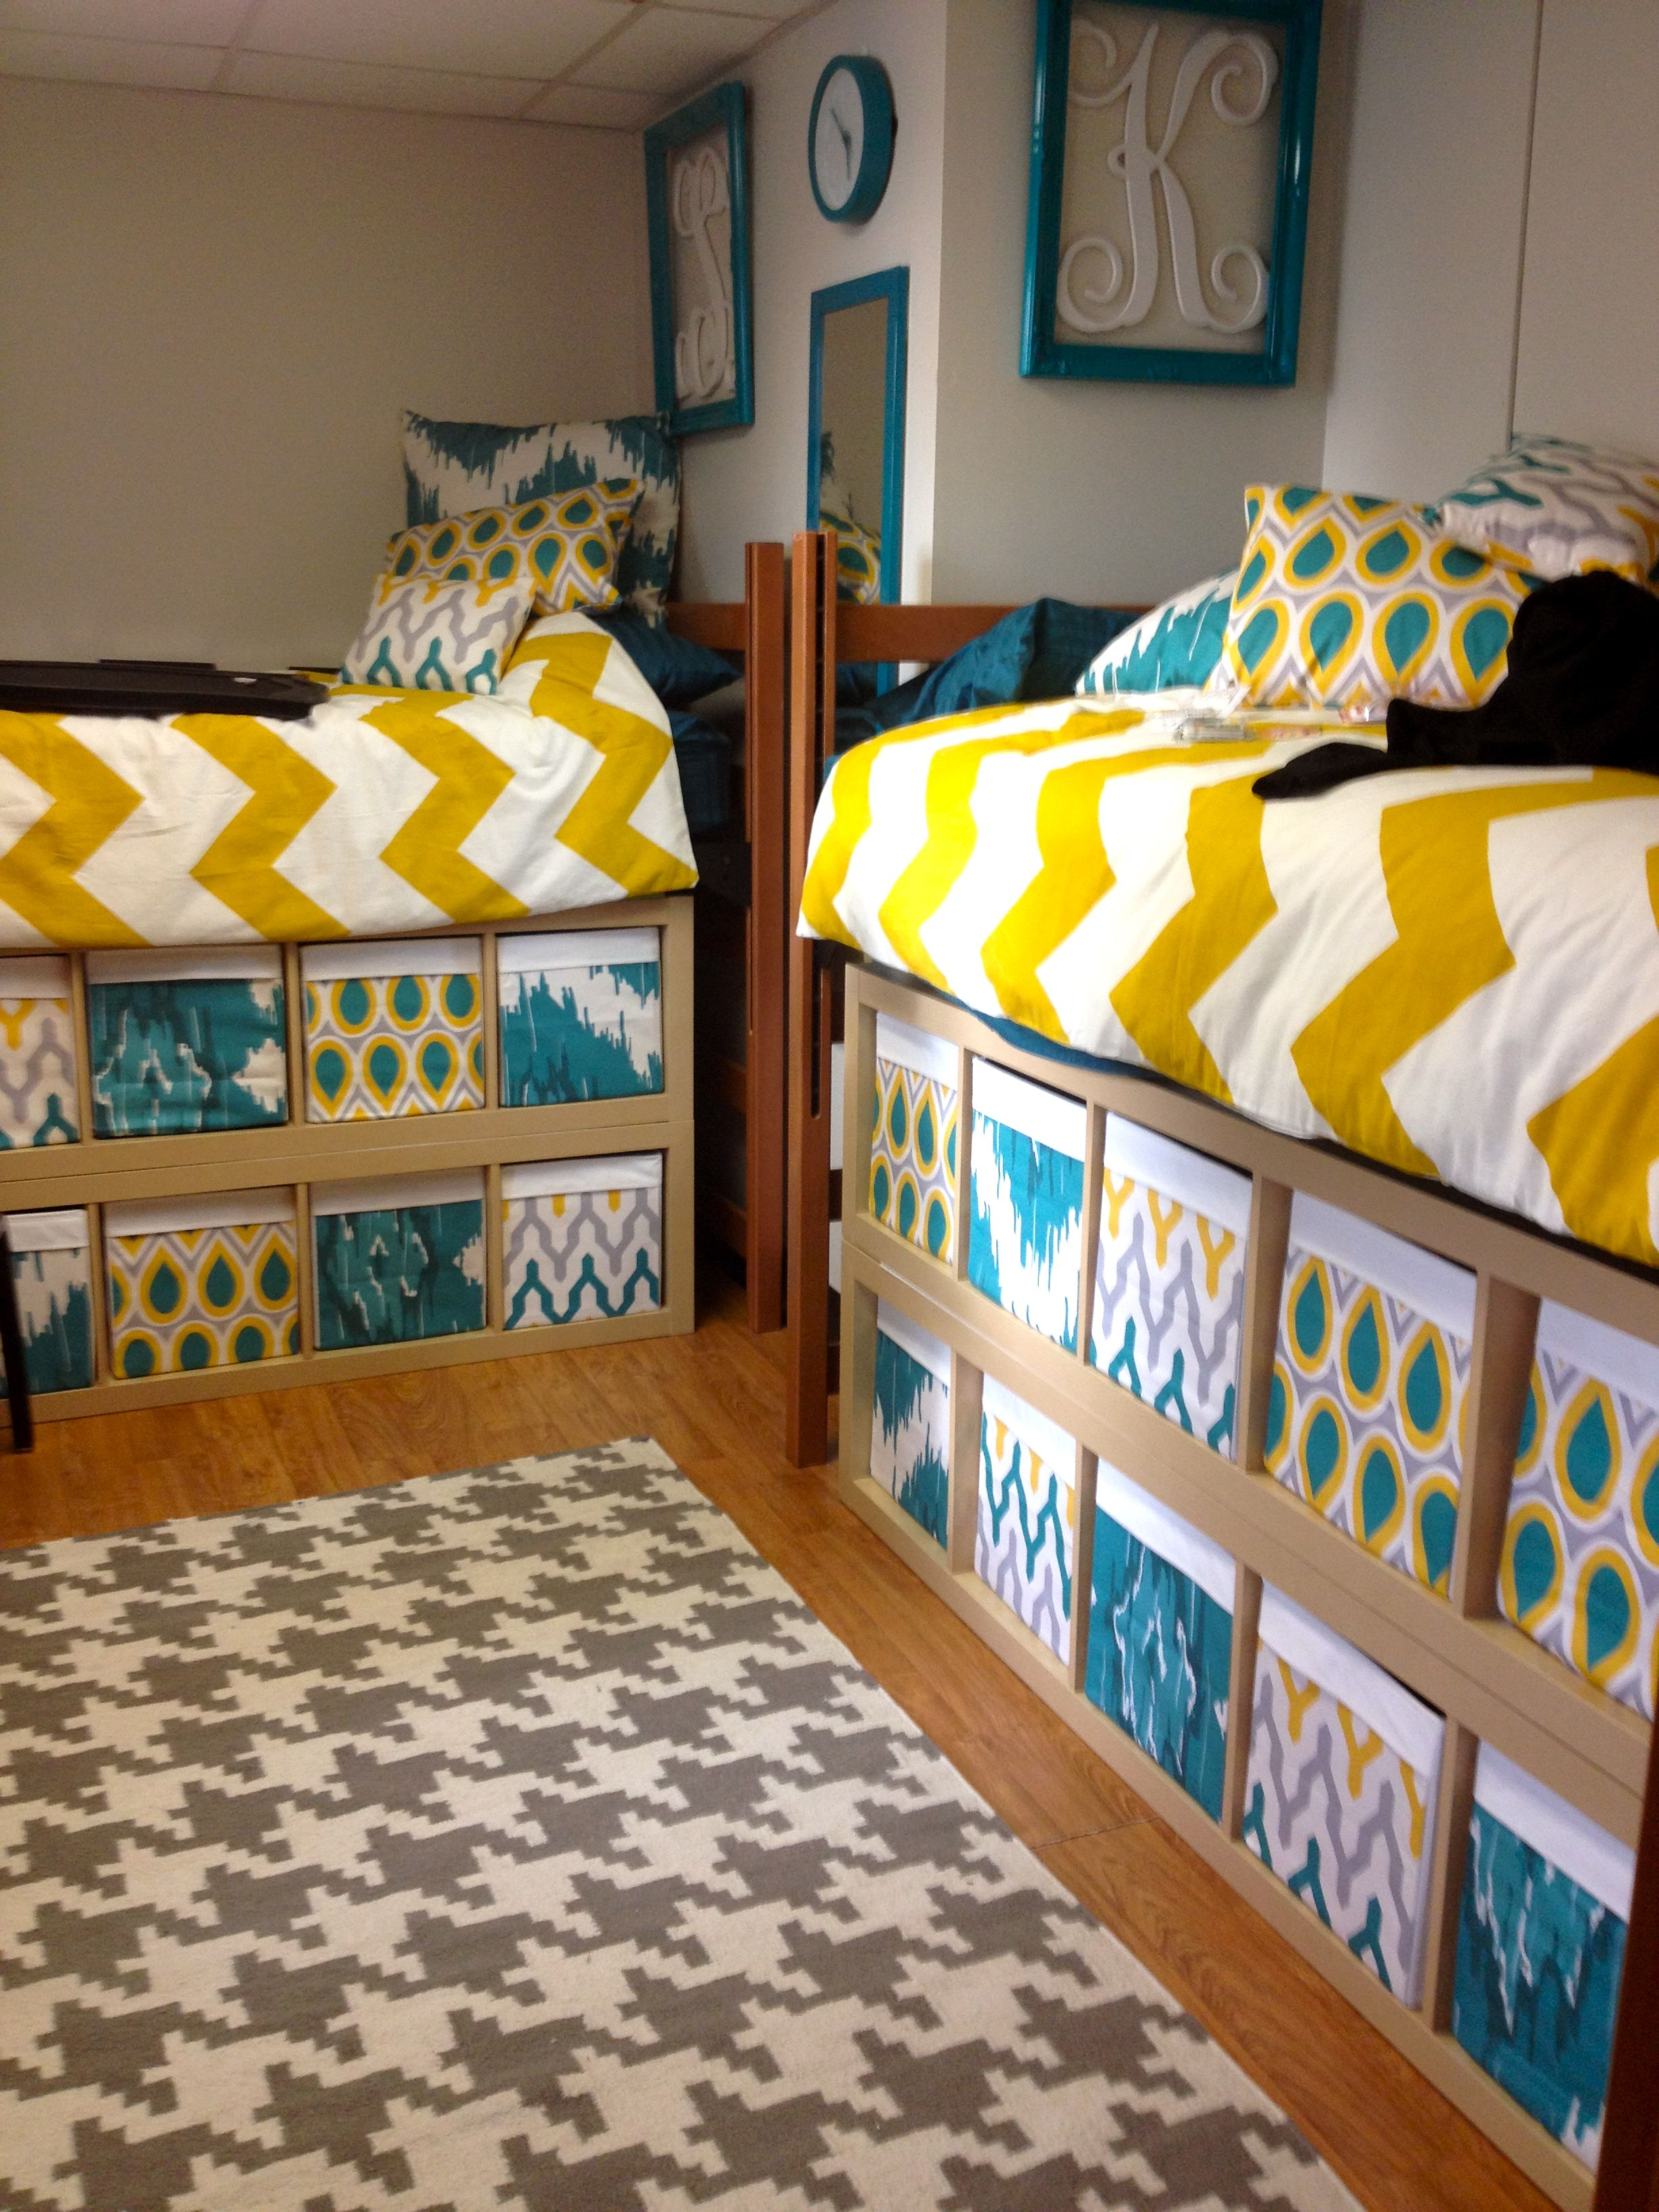 College loft bed ideas  Adorable idea for my future apartment  Home decor   Pinterest